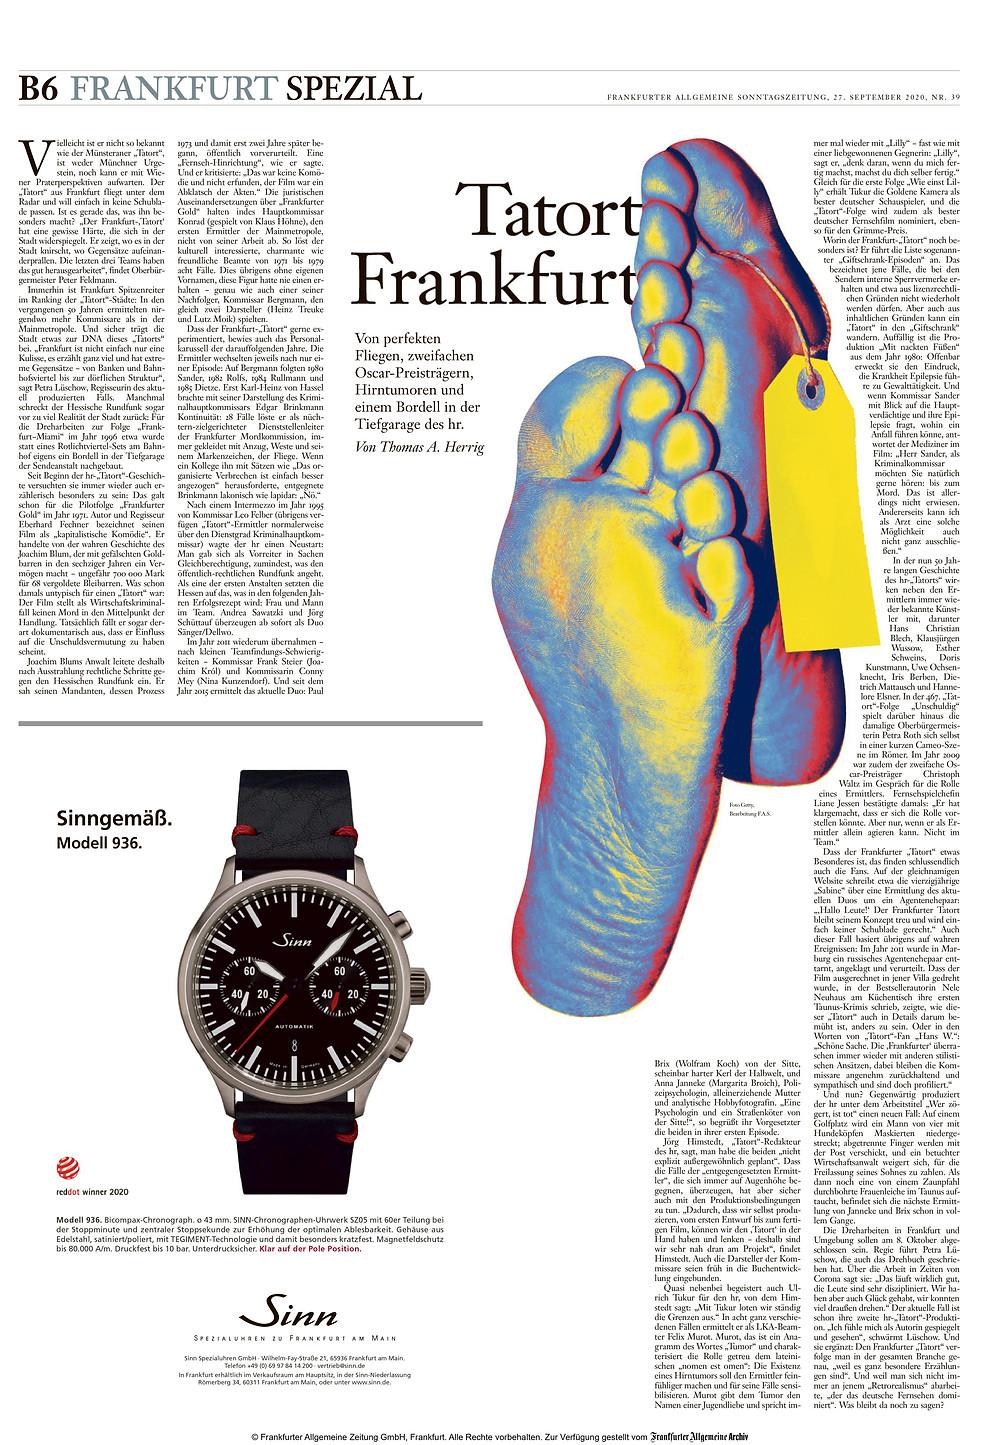 Tatort Frankfurt (von Thomas A. Herrig)